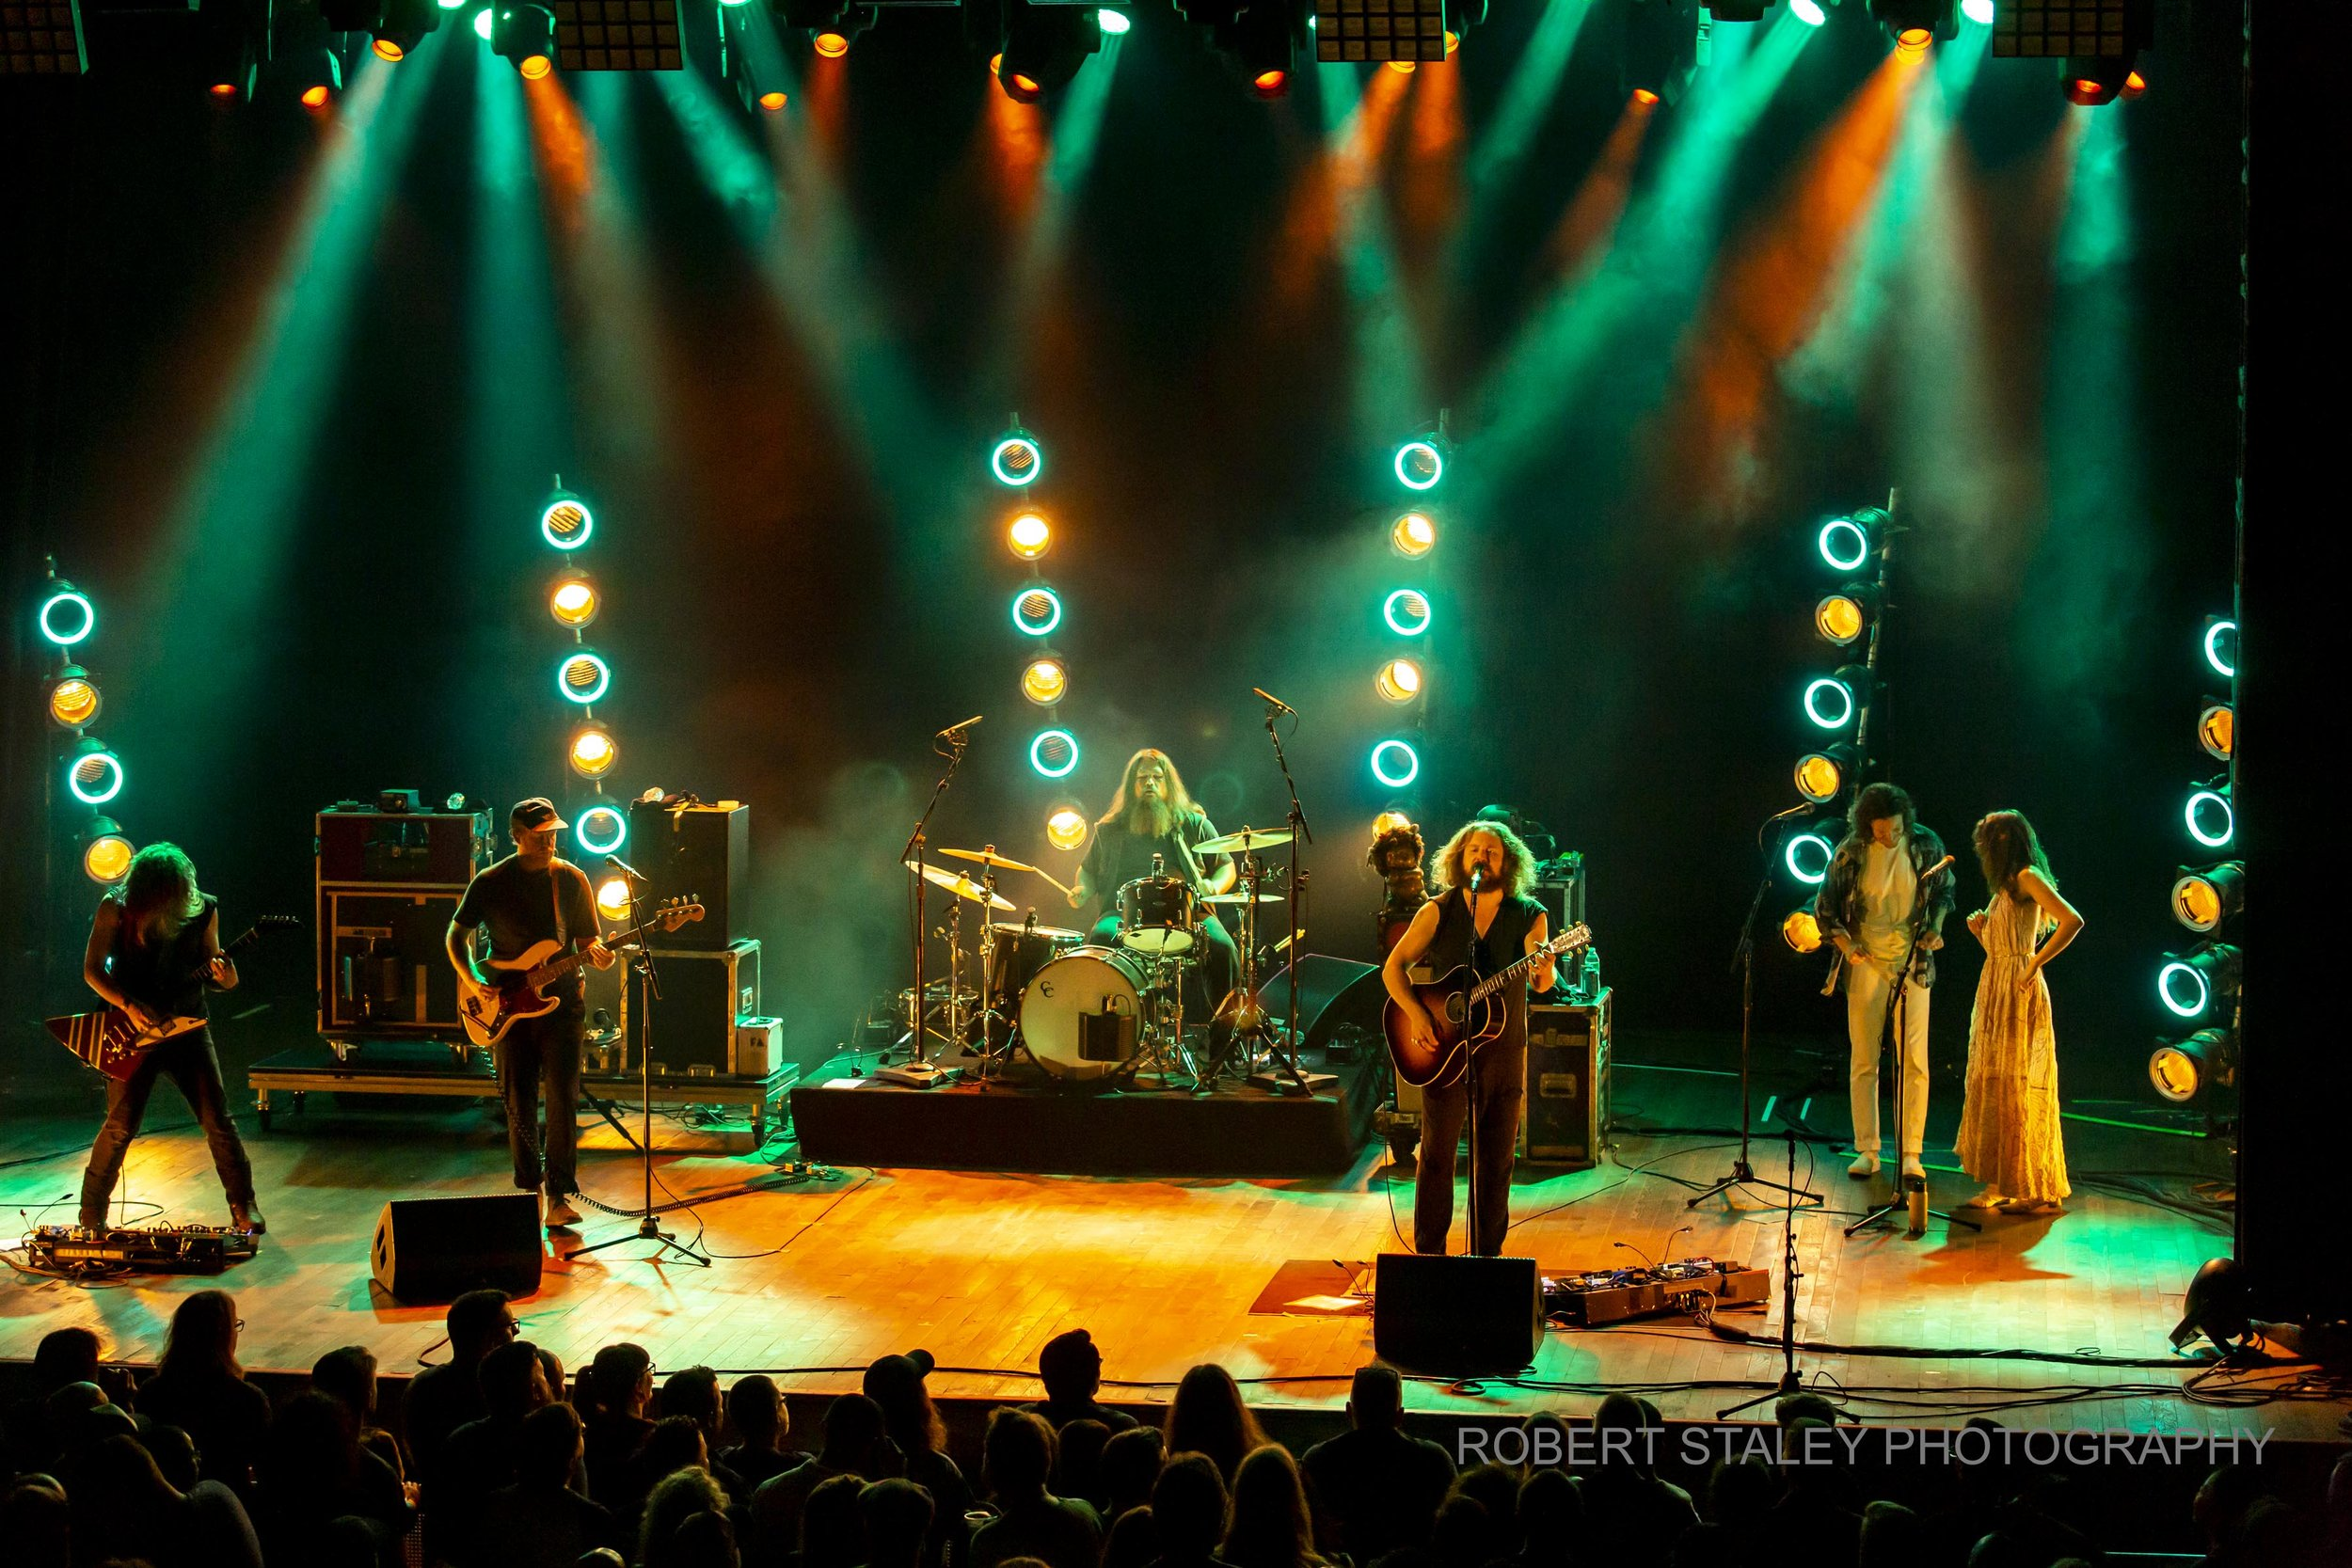 Jim James + Claypool Lennon Delirium - House of Blues Anaheim | July 2, 2019